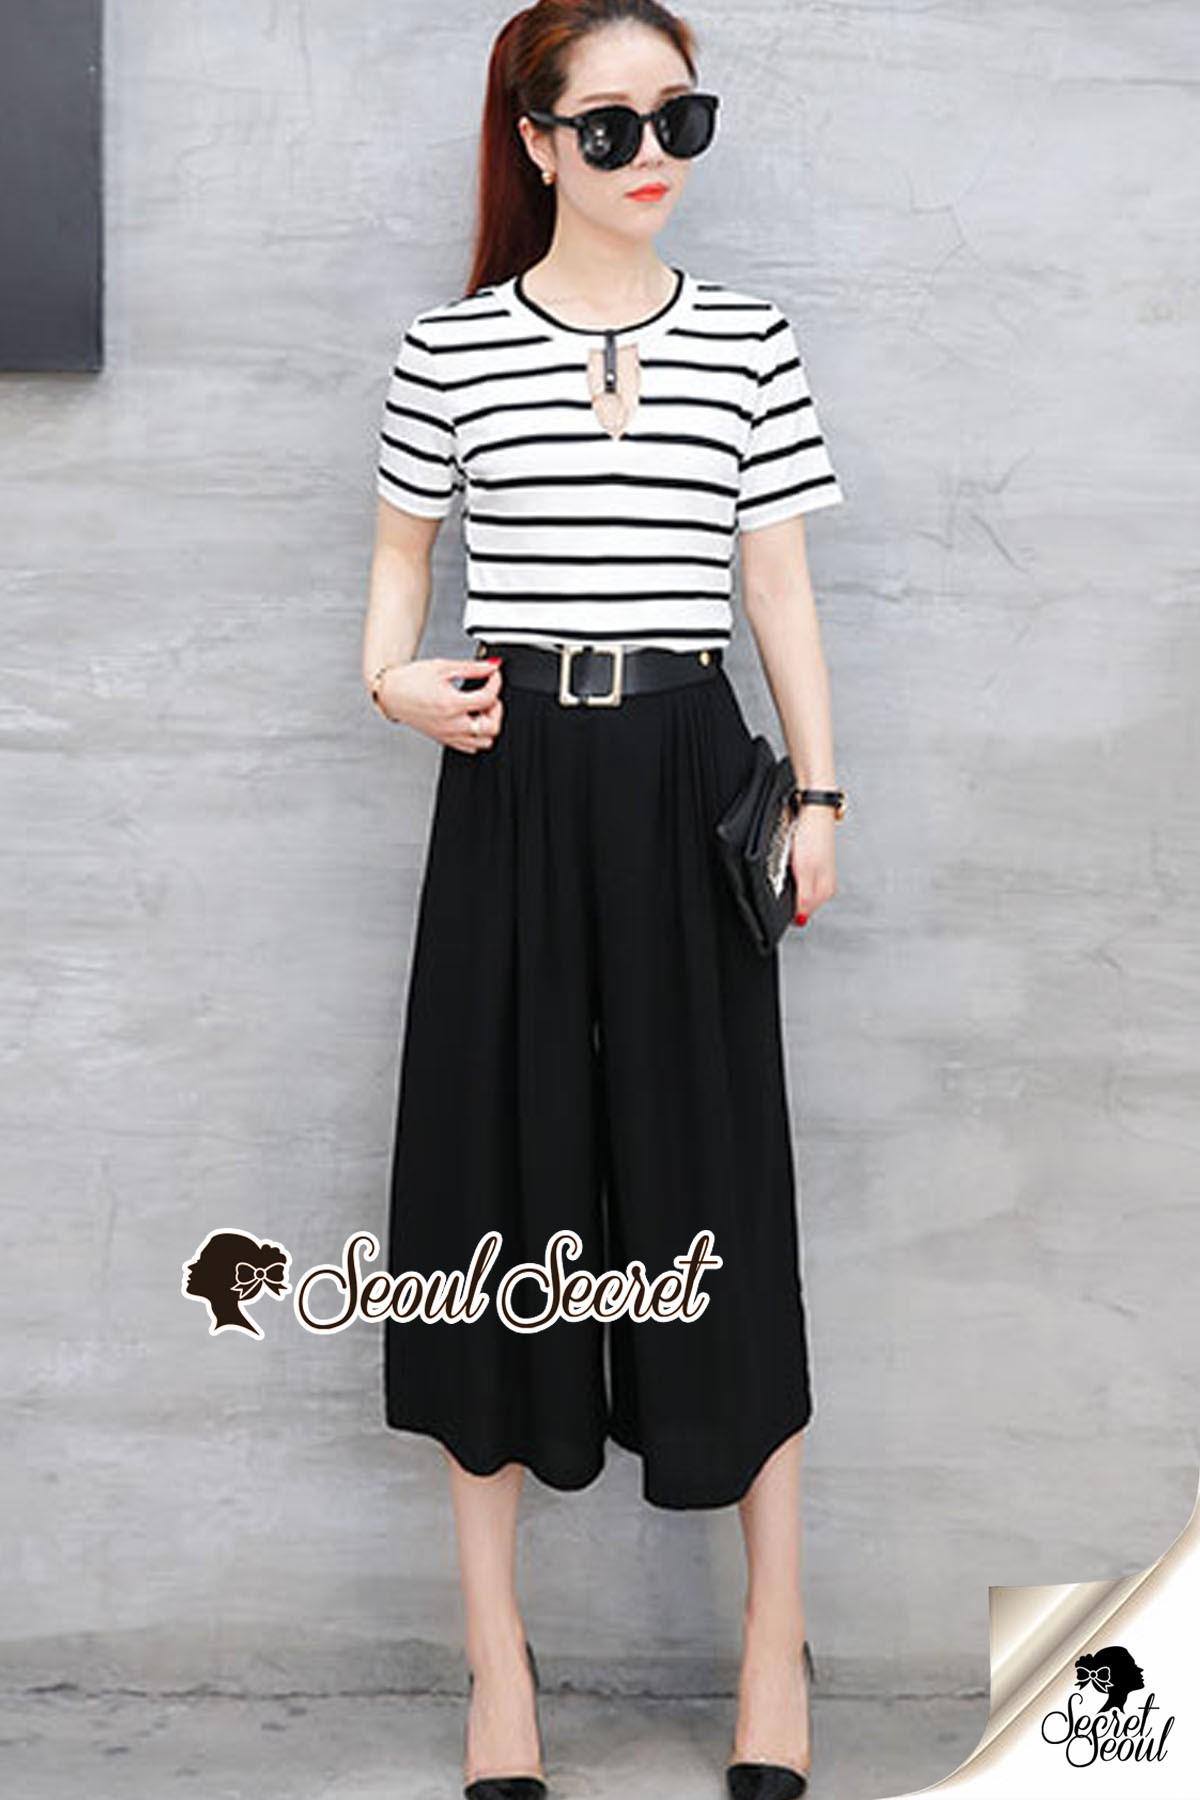 Seoul Secret Say's... Smarty Stripe Sleeve Chic Set